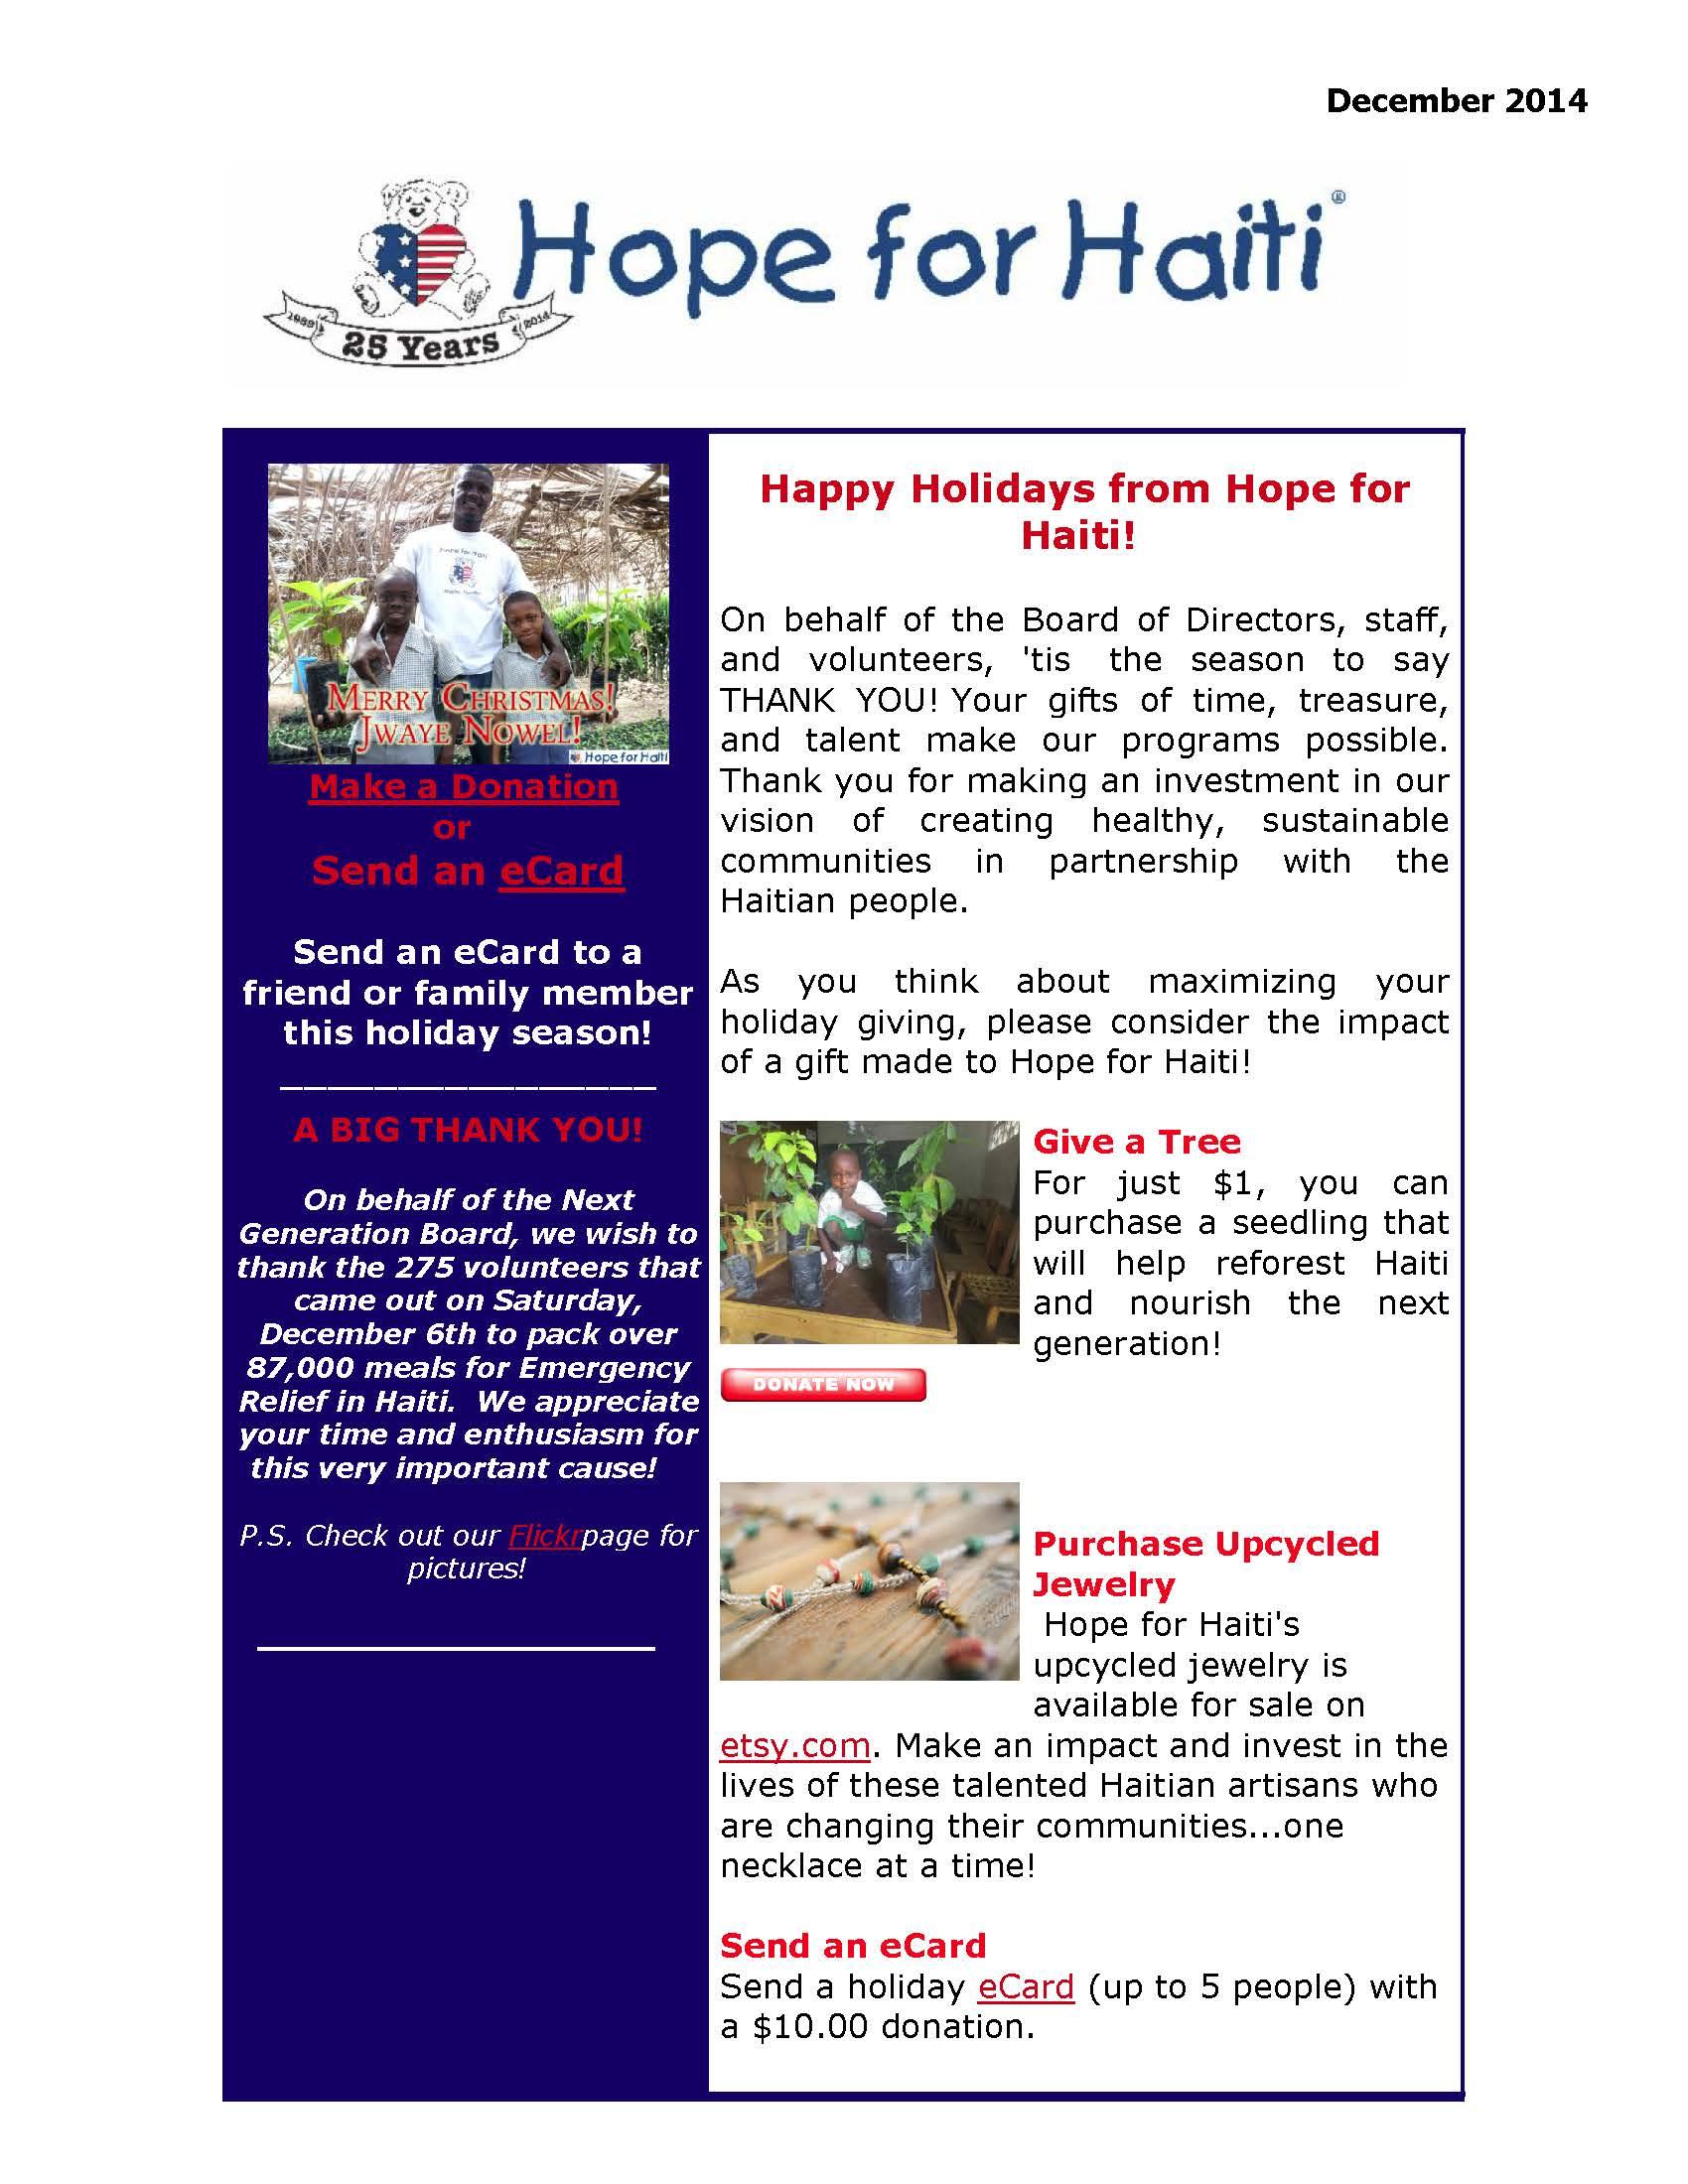 December egram 2014 page 1|December egram 2014 page 1|December egram 2014 page 1|December egram 2014 page 1